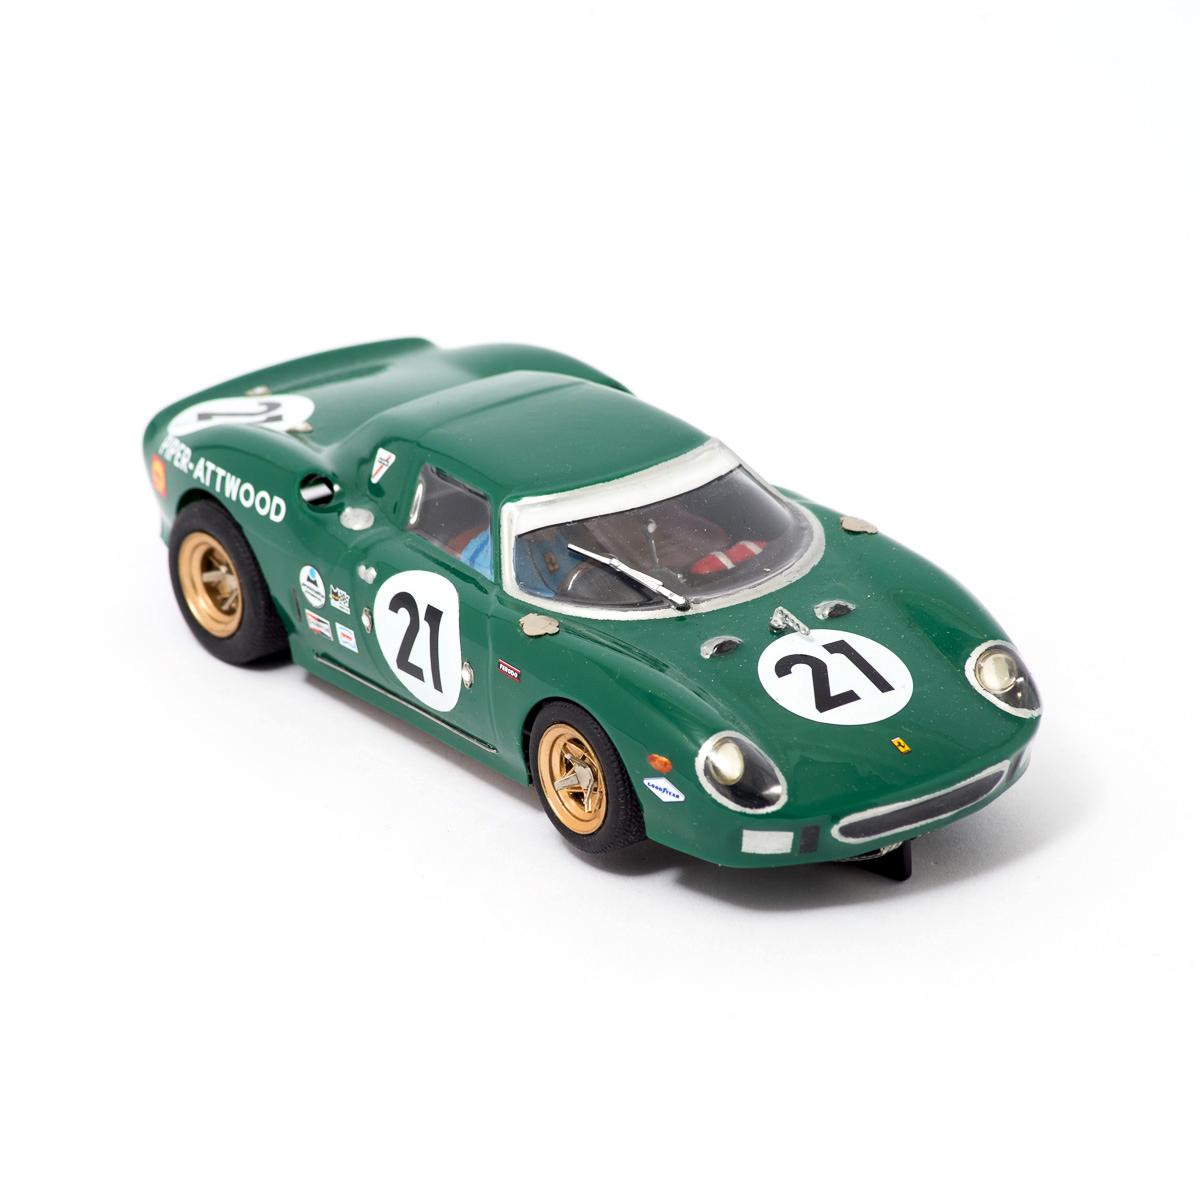 Slot Car Ferrari 250 LM #21 1964 Piper/Atwood 1:24